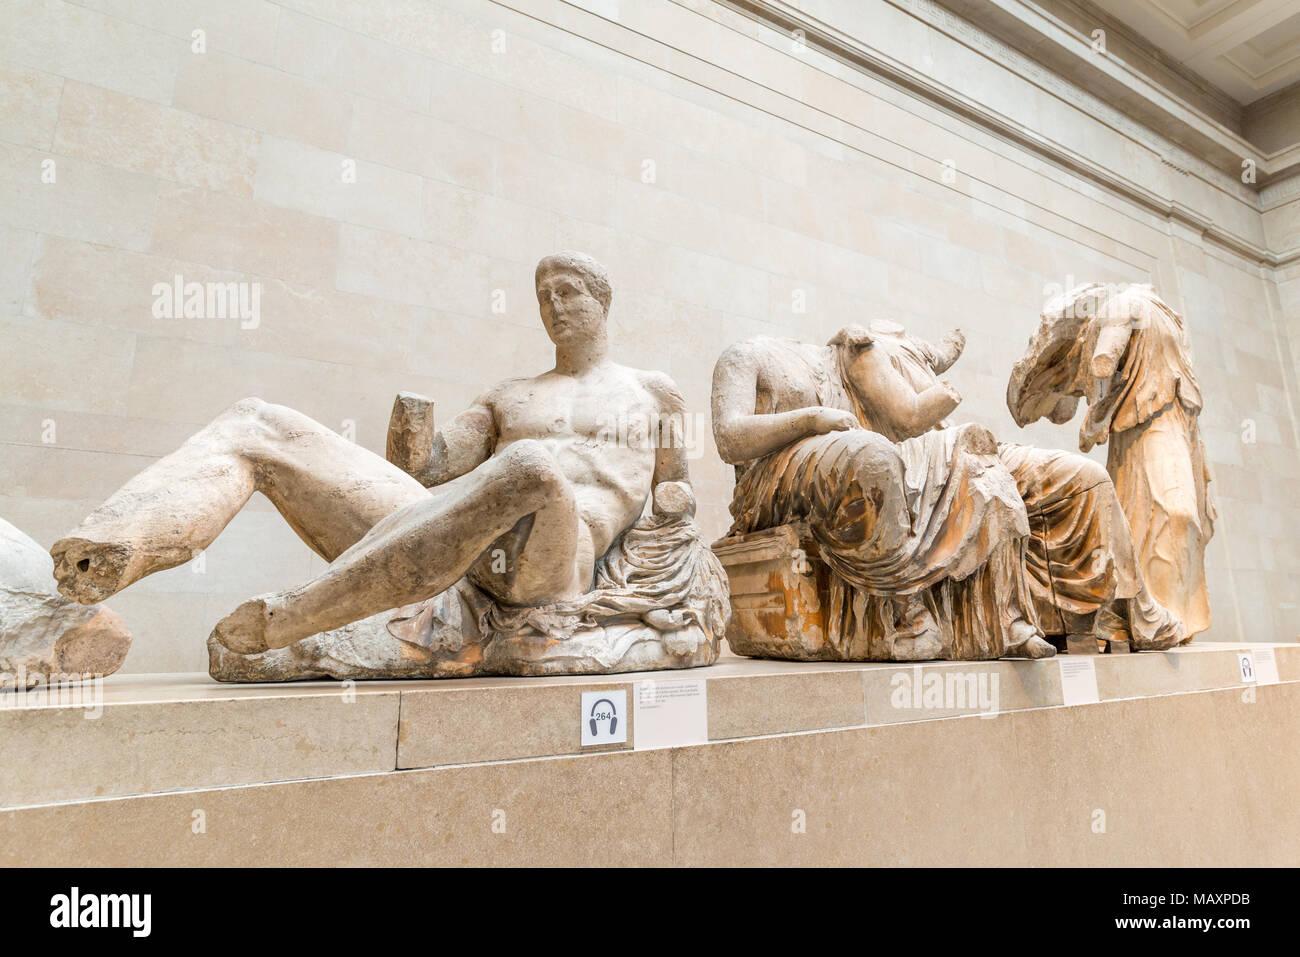 Die Elgin Marbles im British Museum, London, UK Stockbild